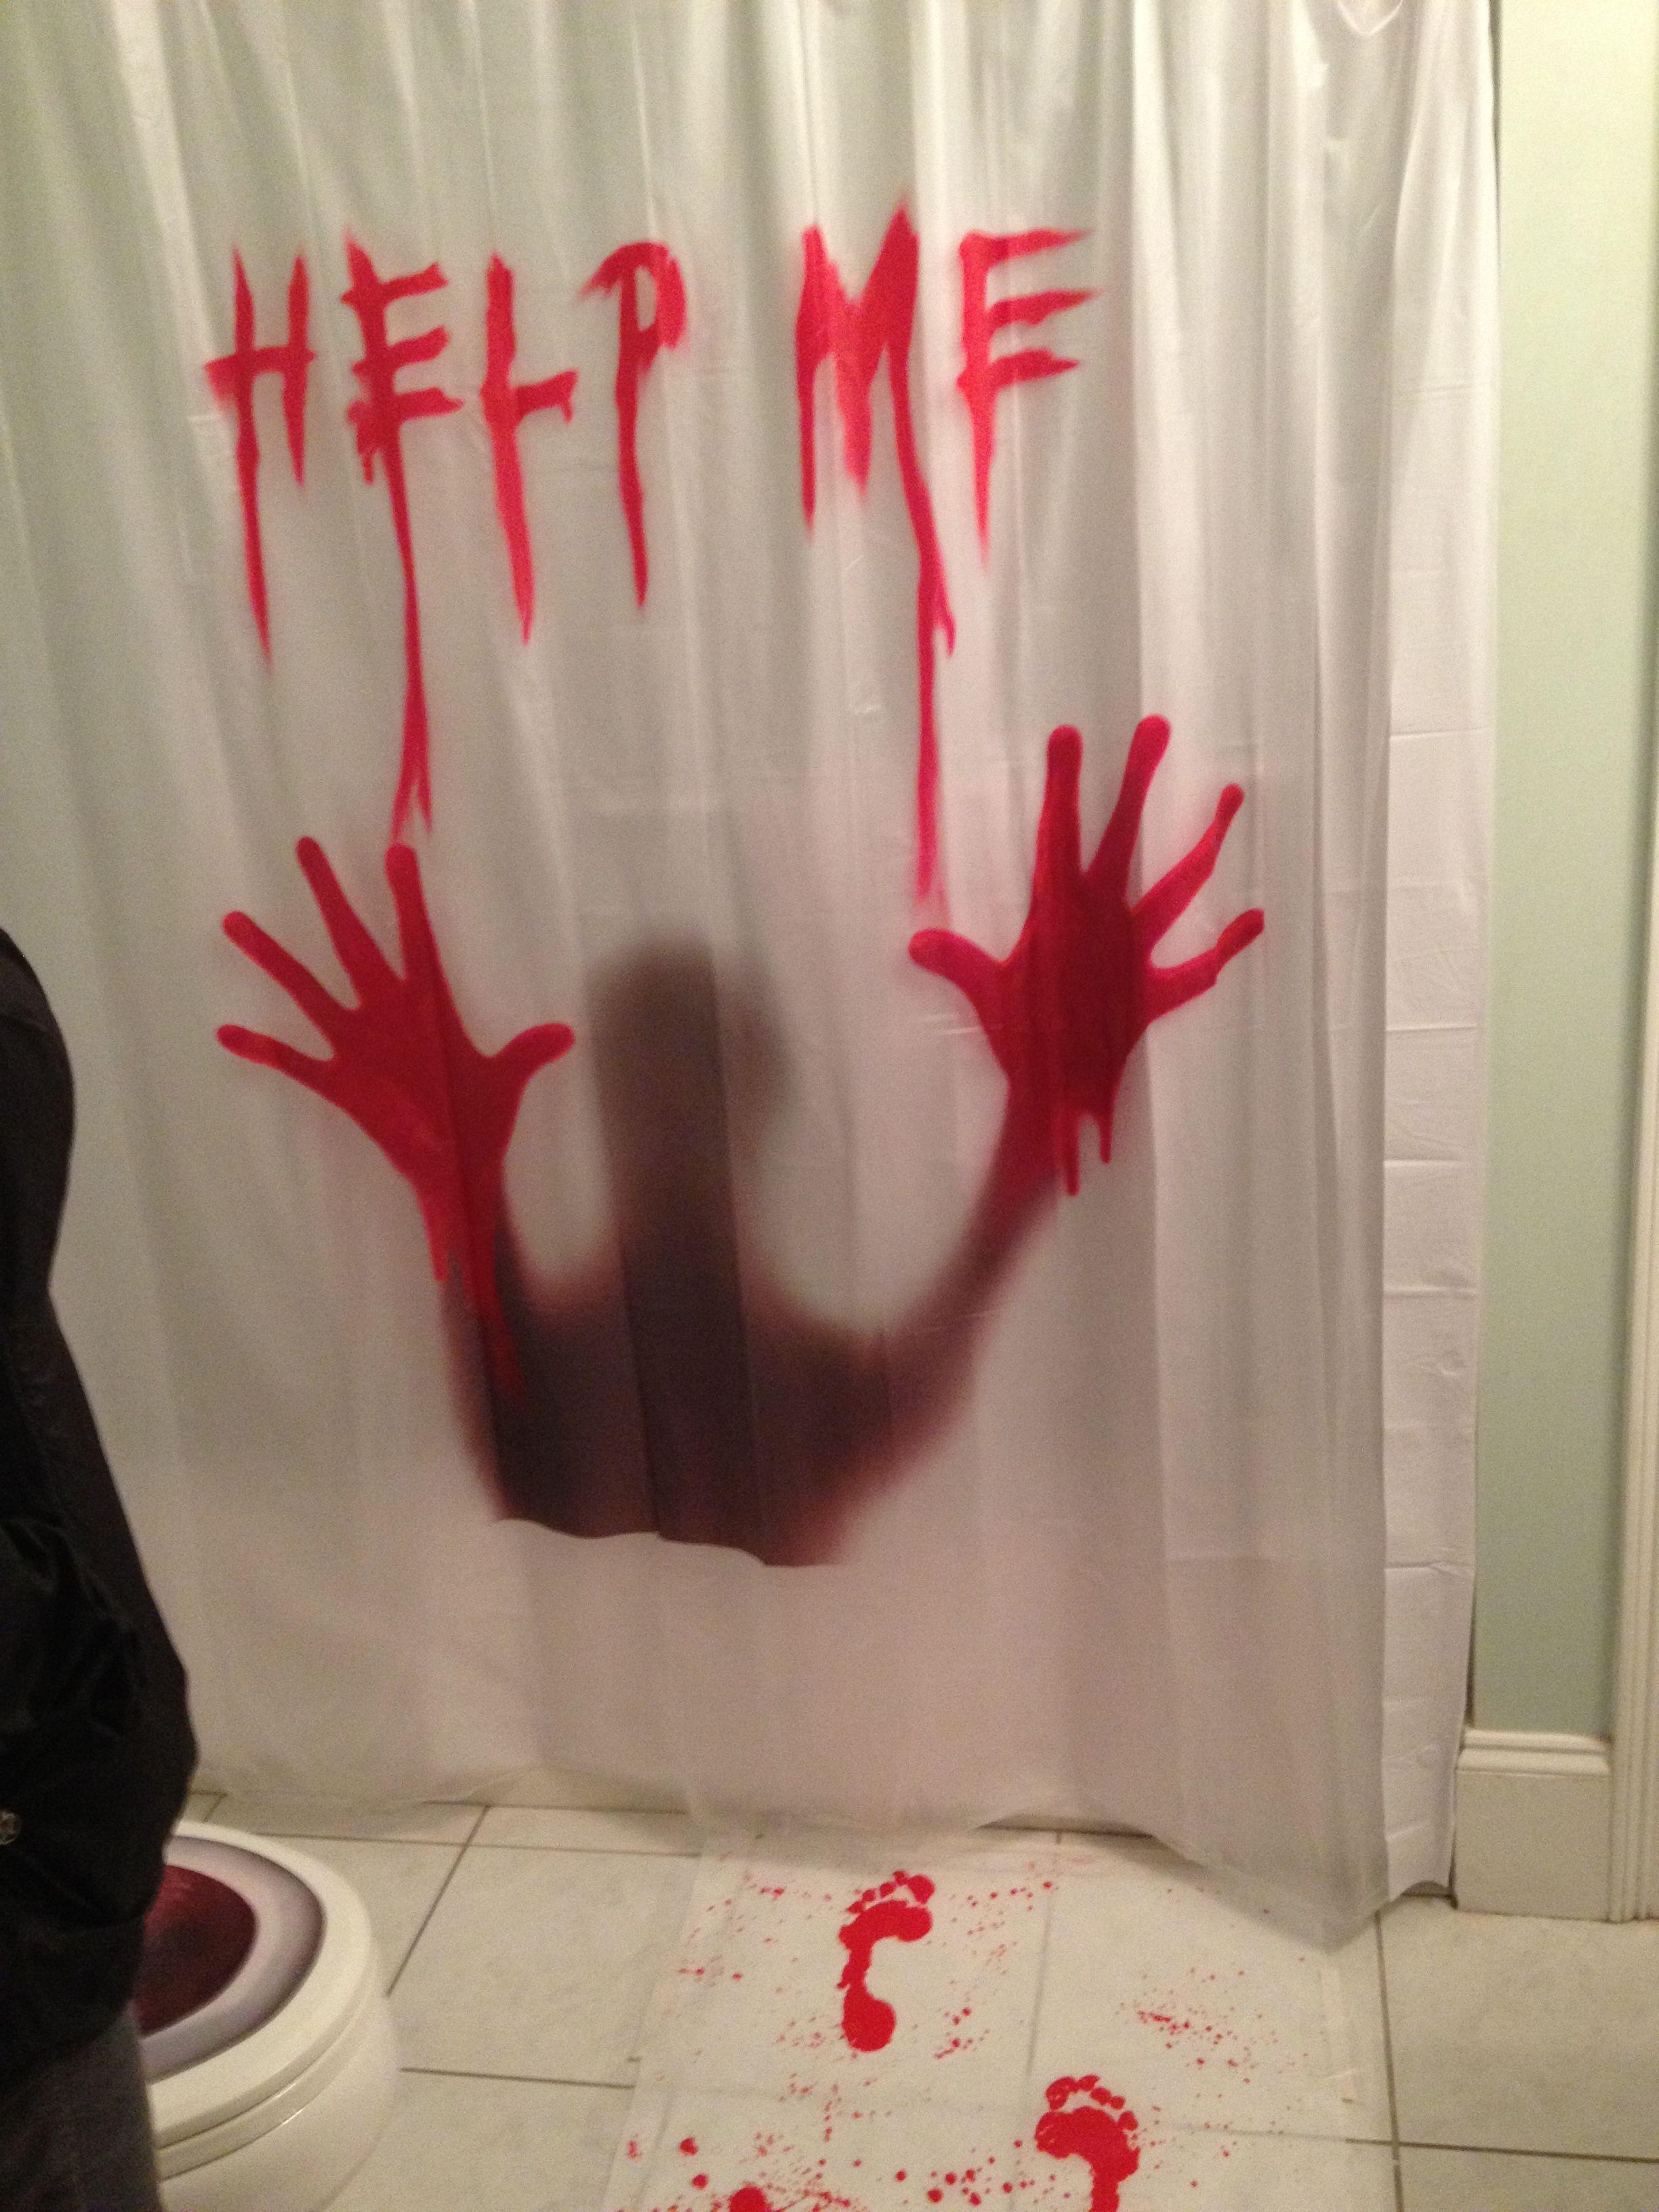 Scary Bathroom For Halloween Creepy Halloween Decorations Halloween Bathroom Halloween Bathroom Decorations